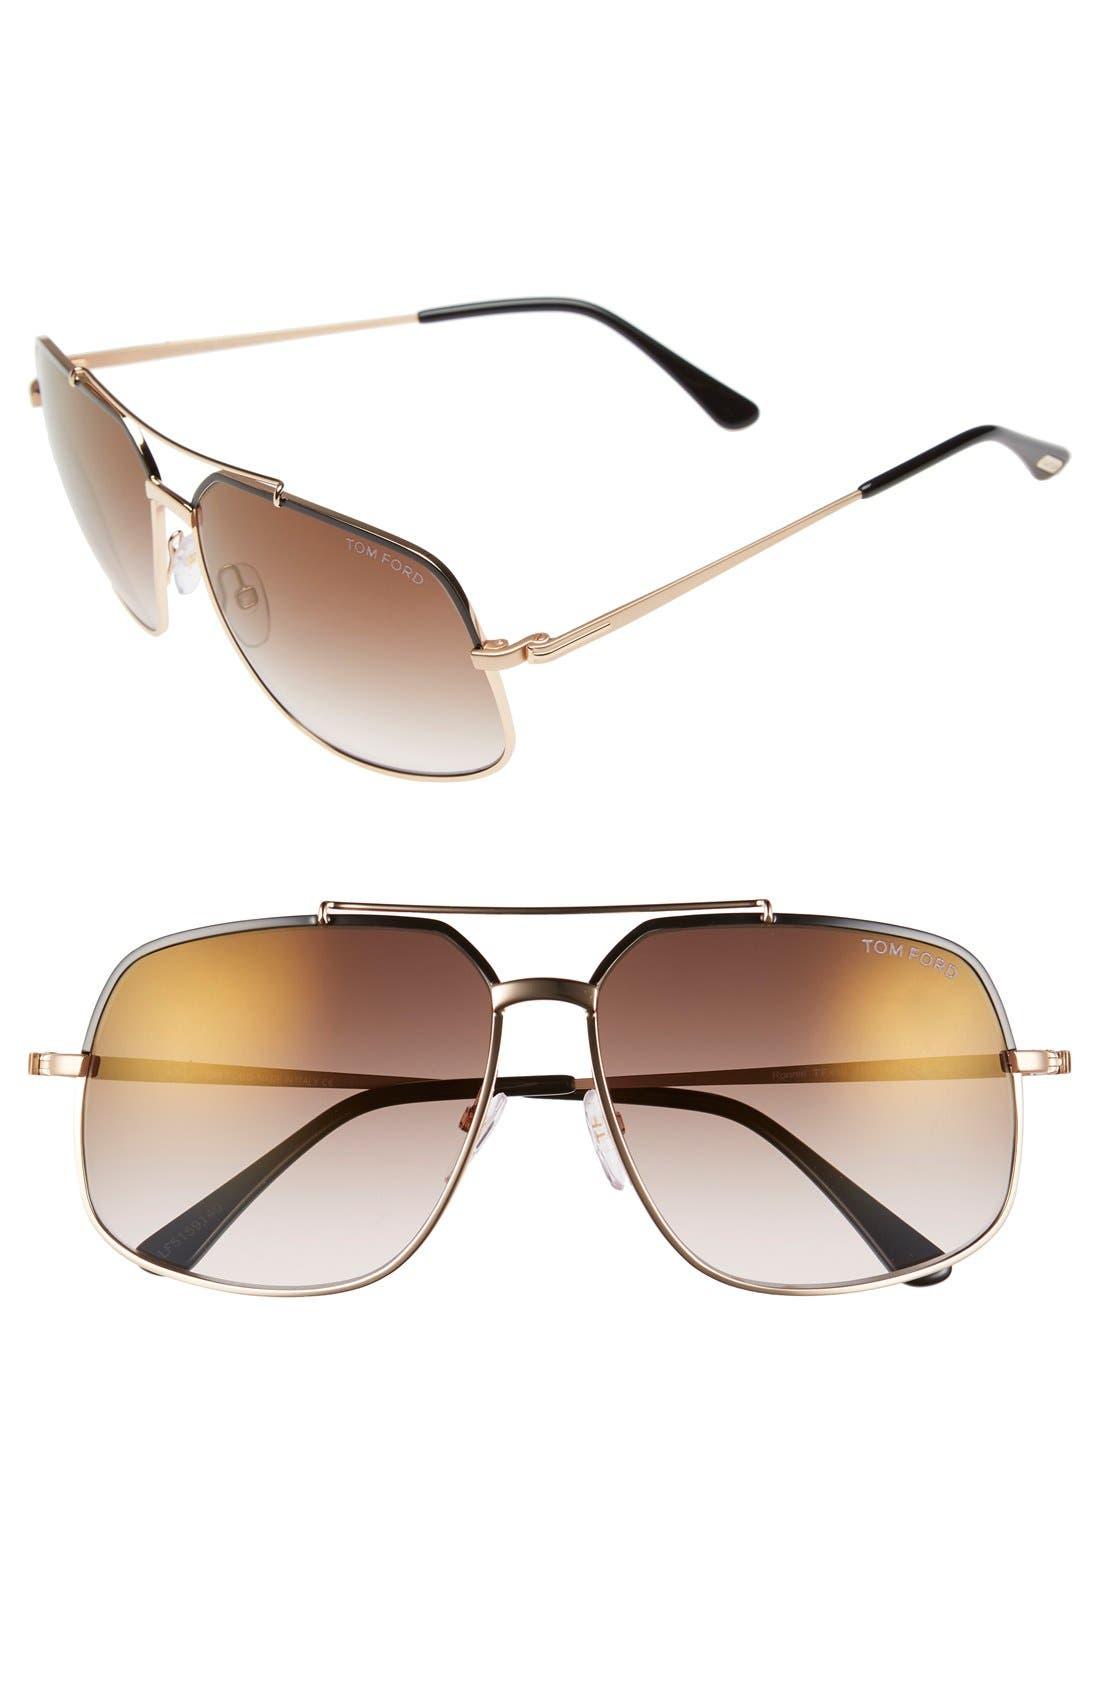 Tom Ford 'Ronnie' 60mm Aviator Sunglasses